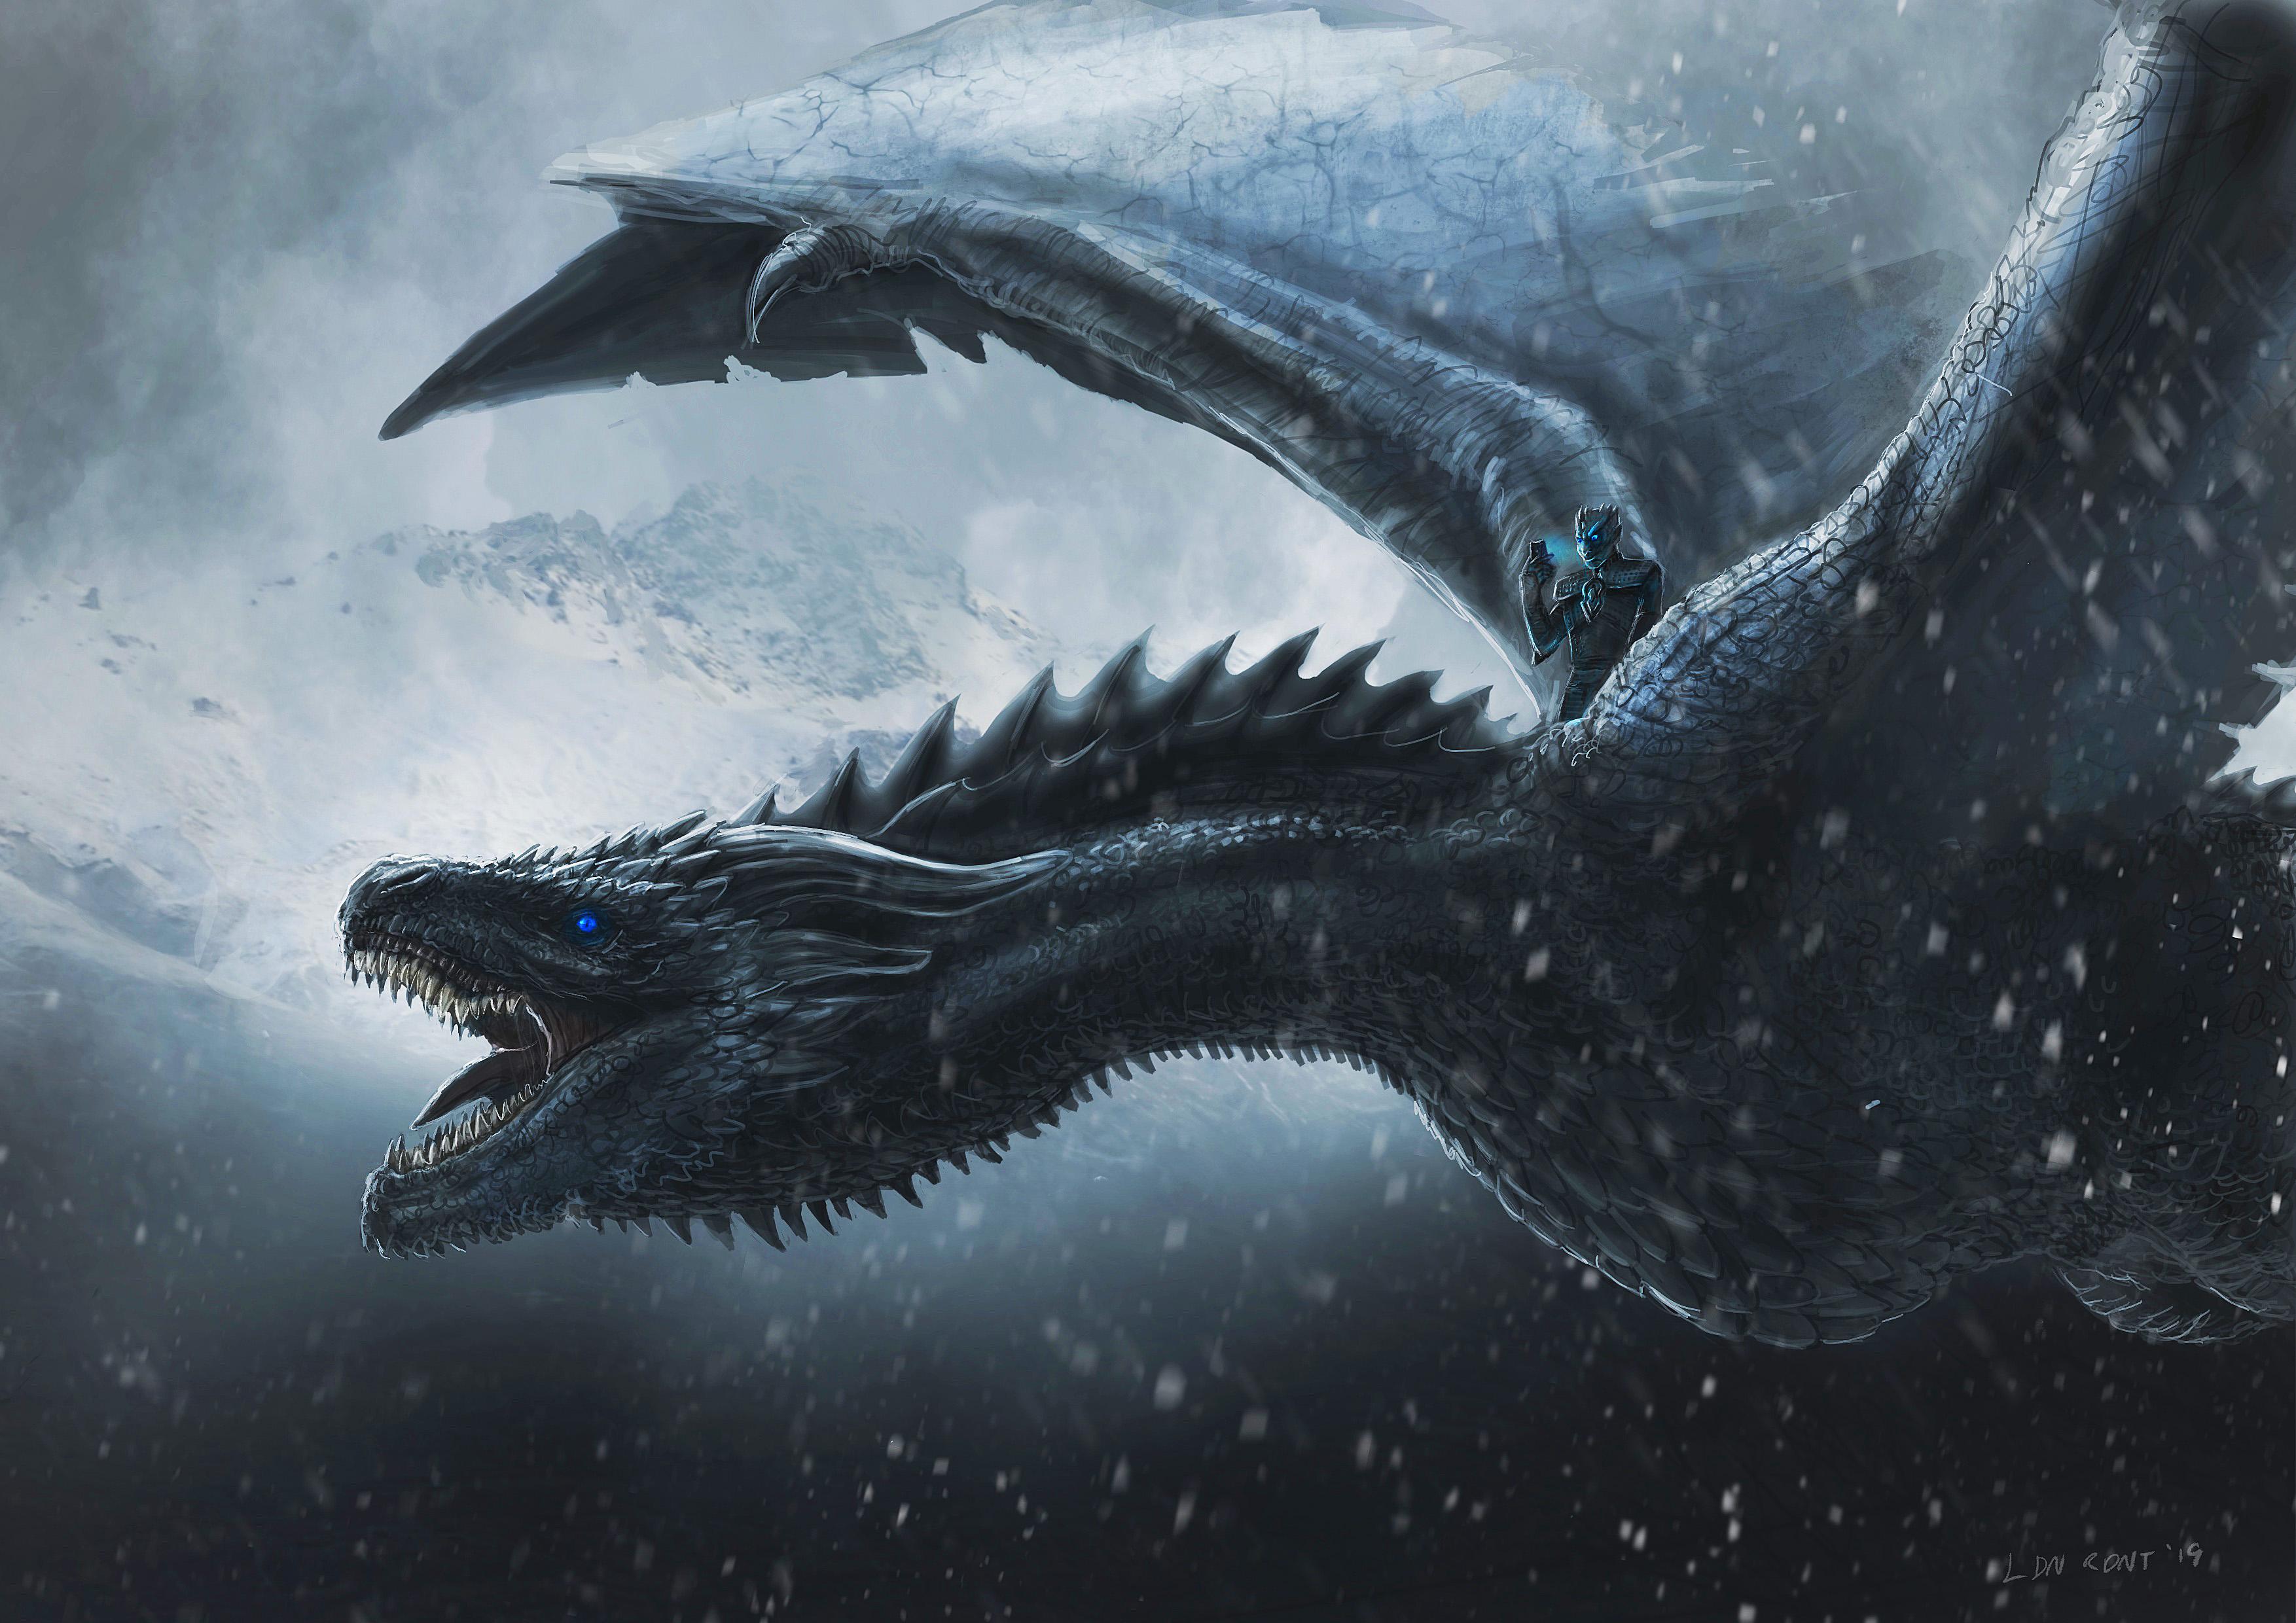 1400x900 Night King Dragon 4k 1400x900 Resolution Hd 4k